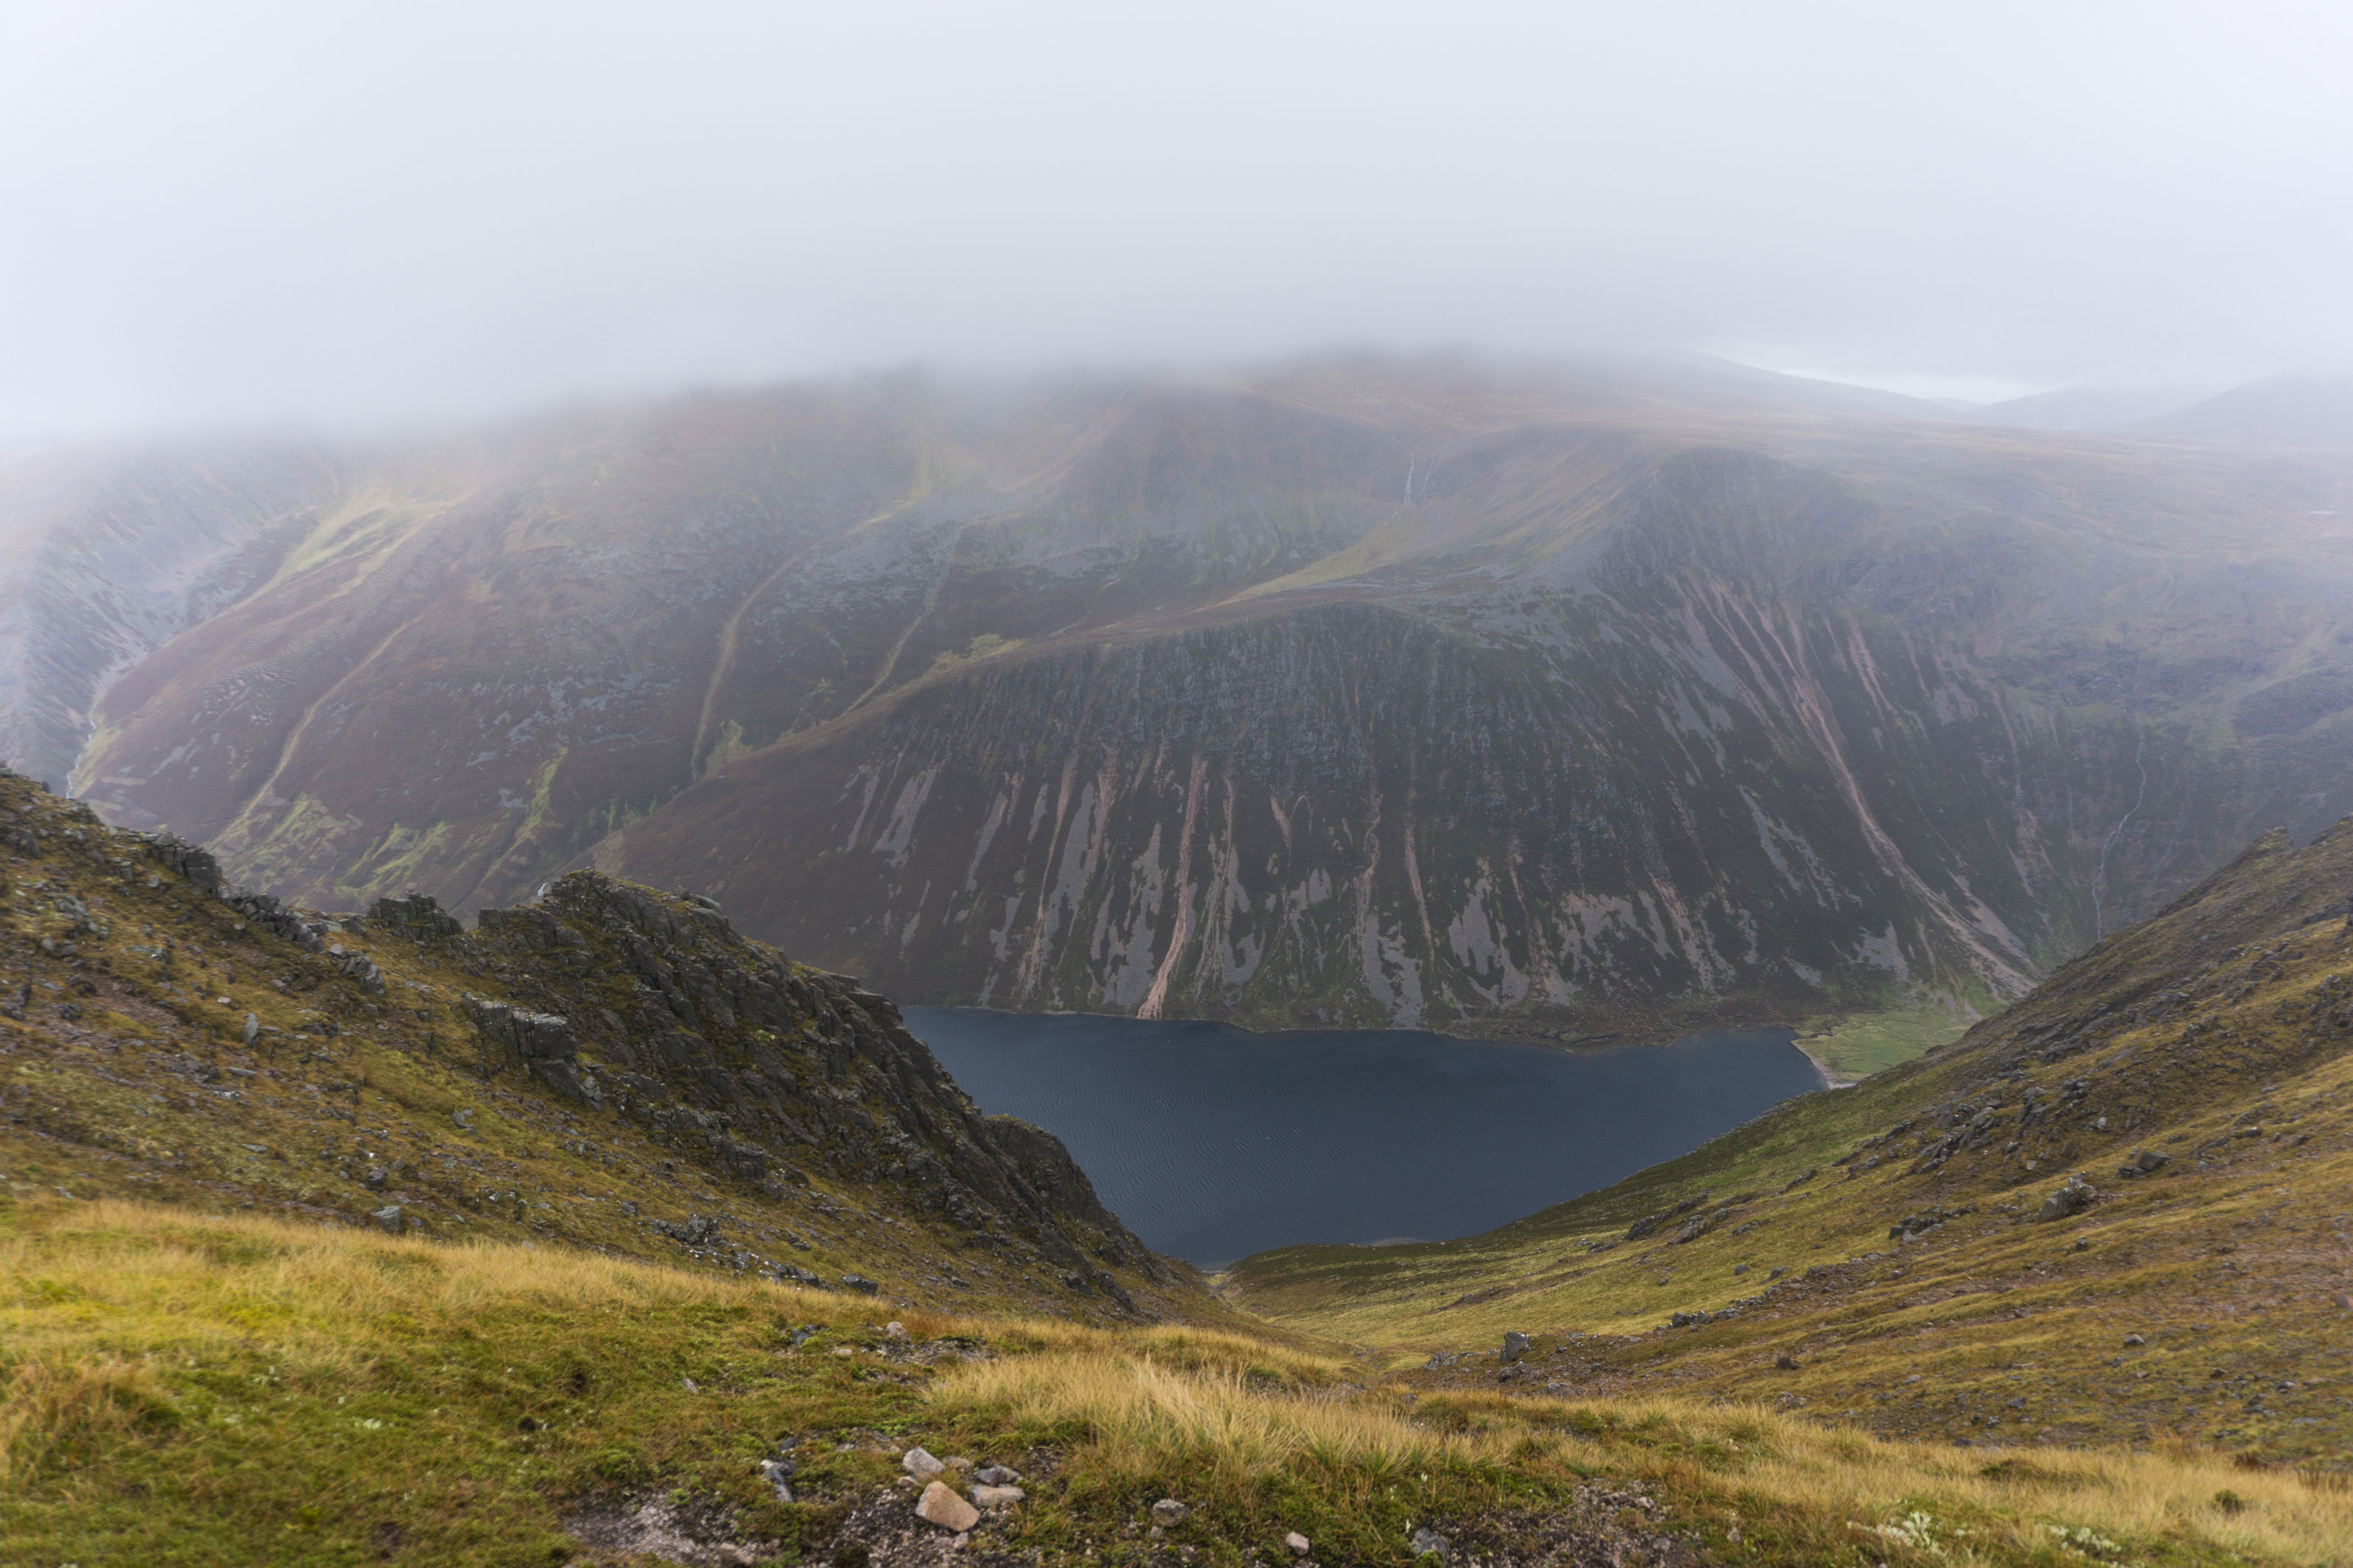 Vzhůru k Loch Einich v srdci Cairngorms